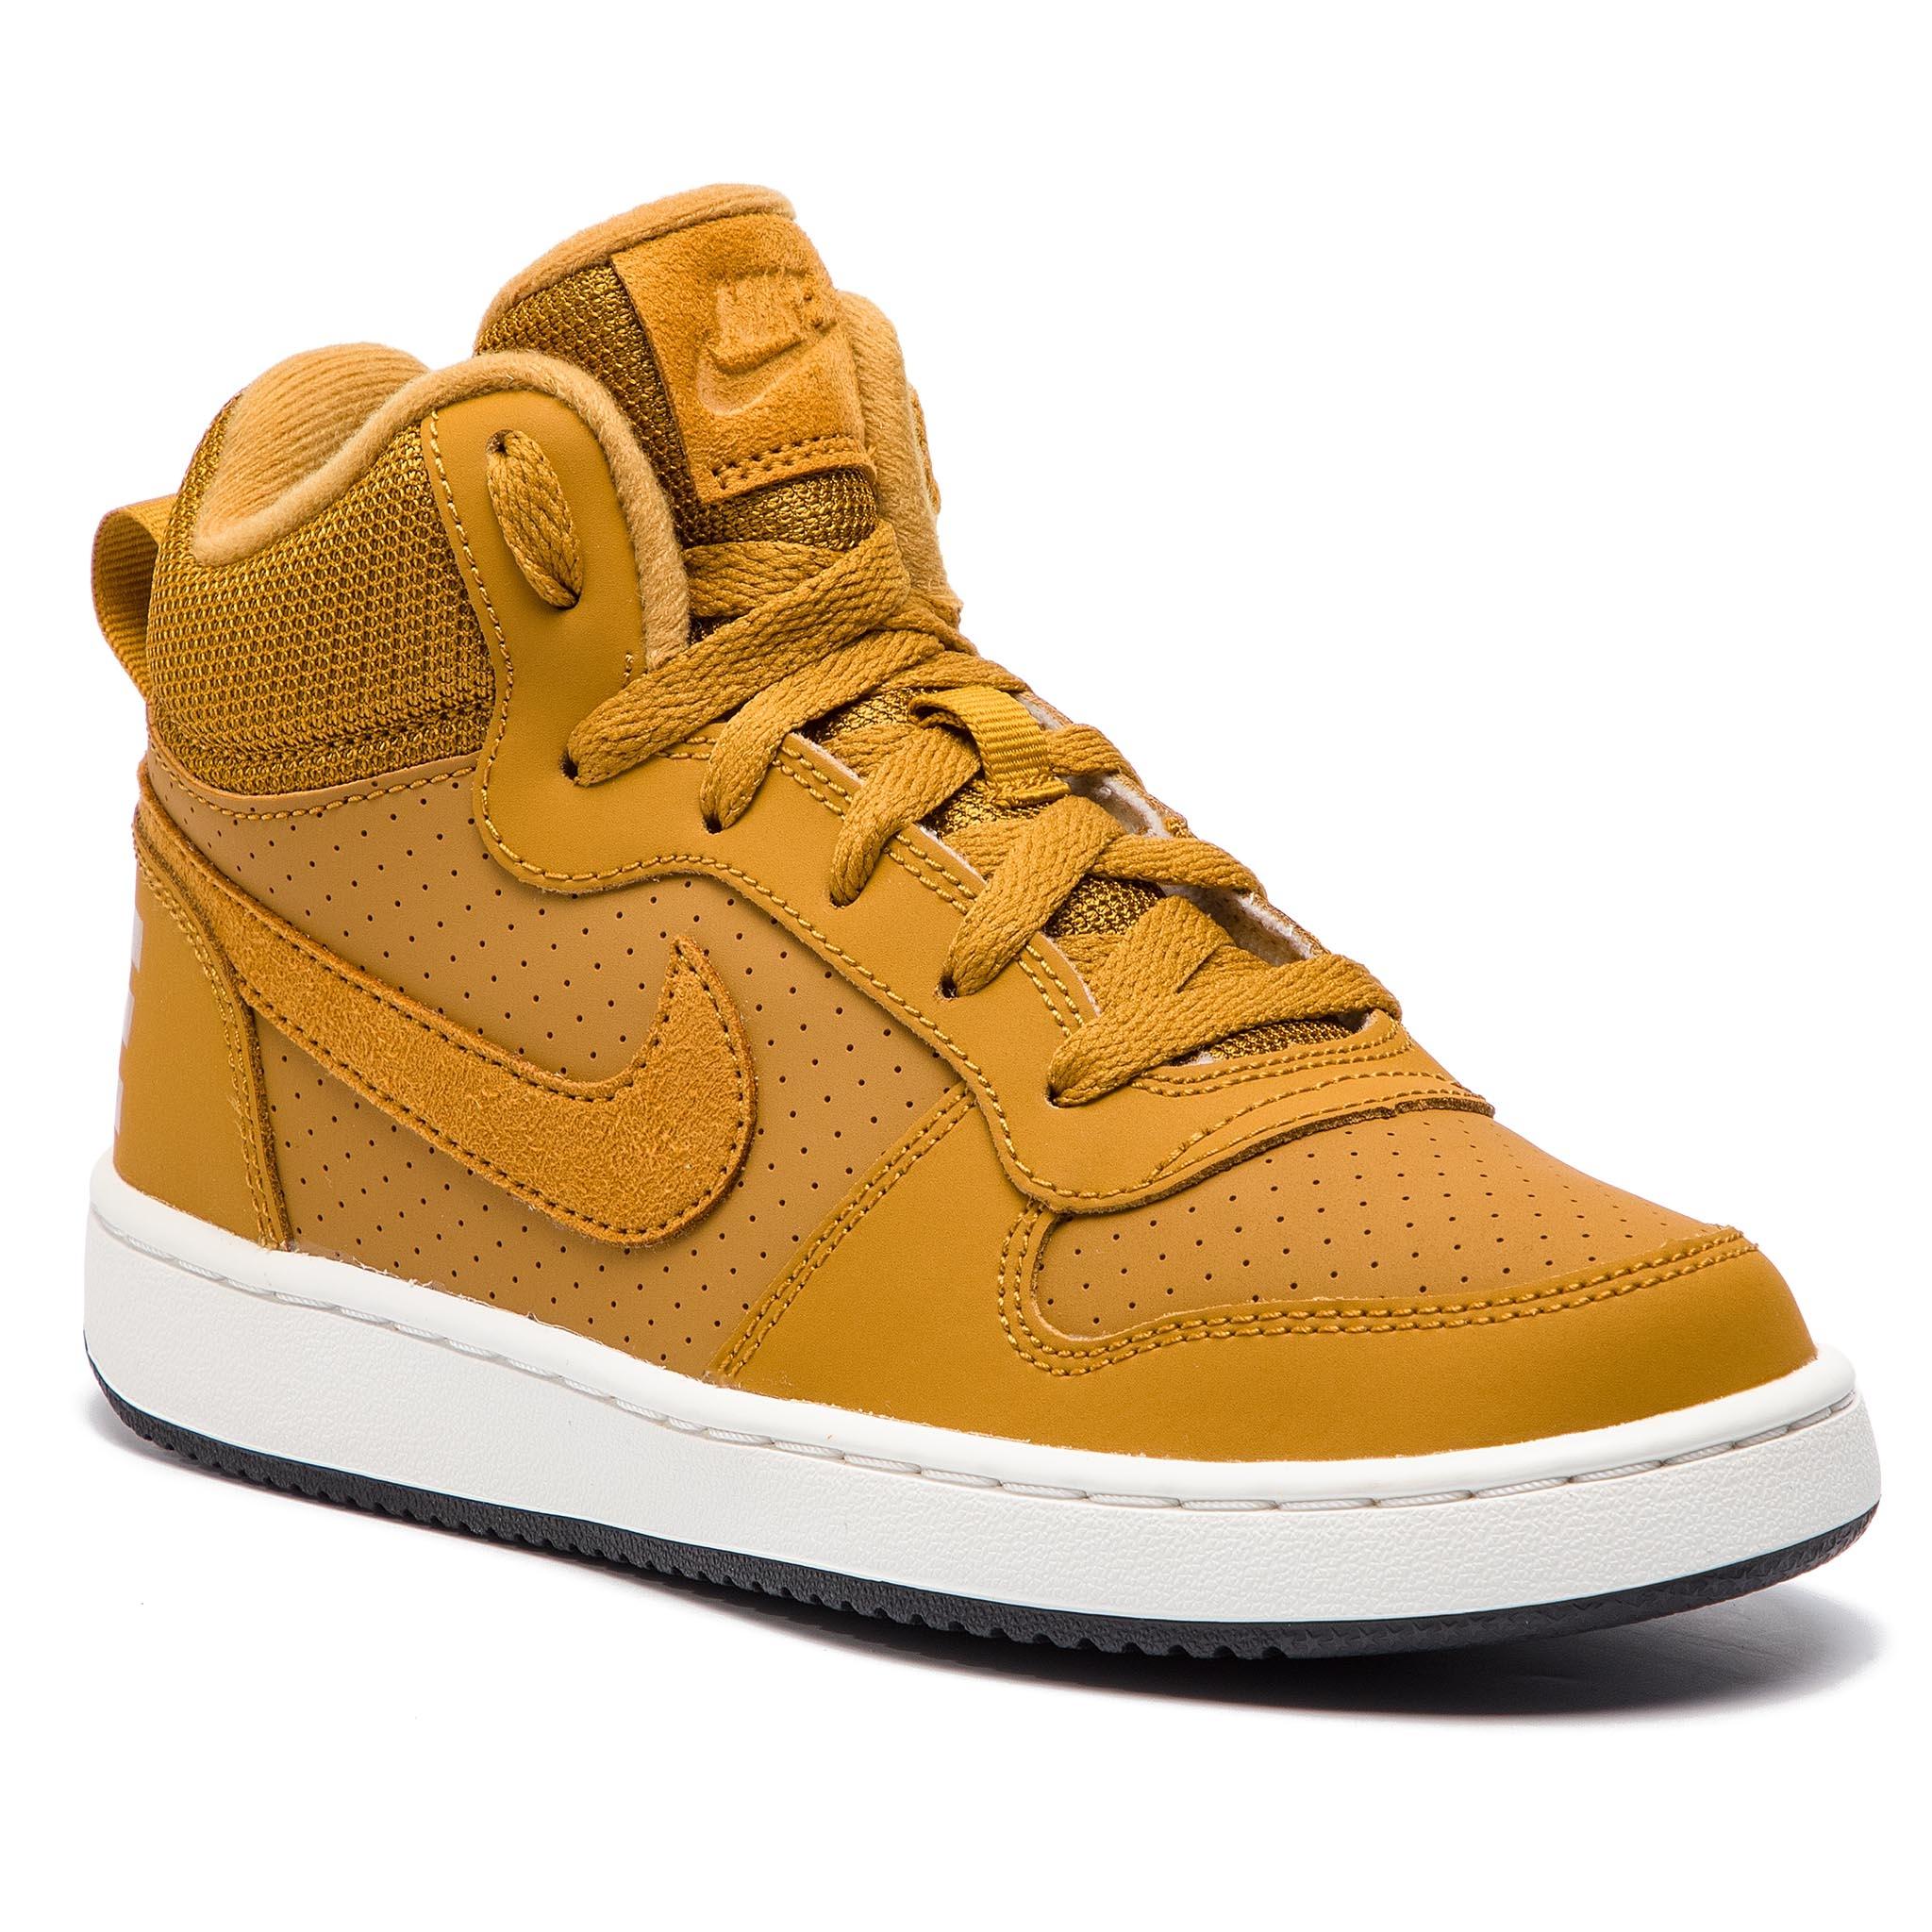 10c21242898cc Shoes NIKE Court Borough Mid (GS) 839977 701 Wheat Wheat Summit White Black